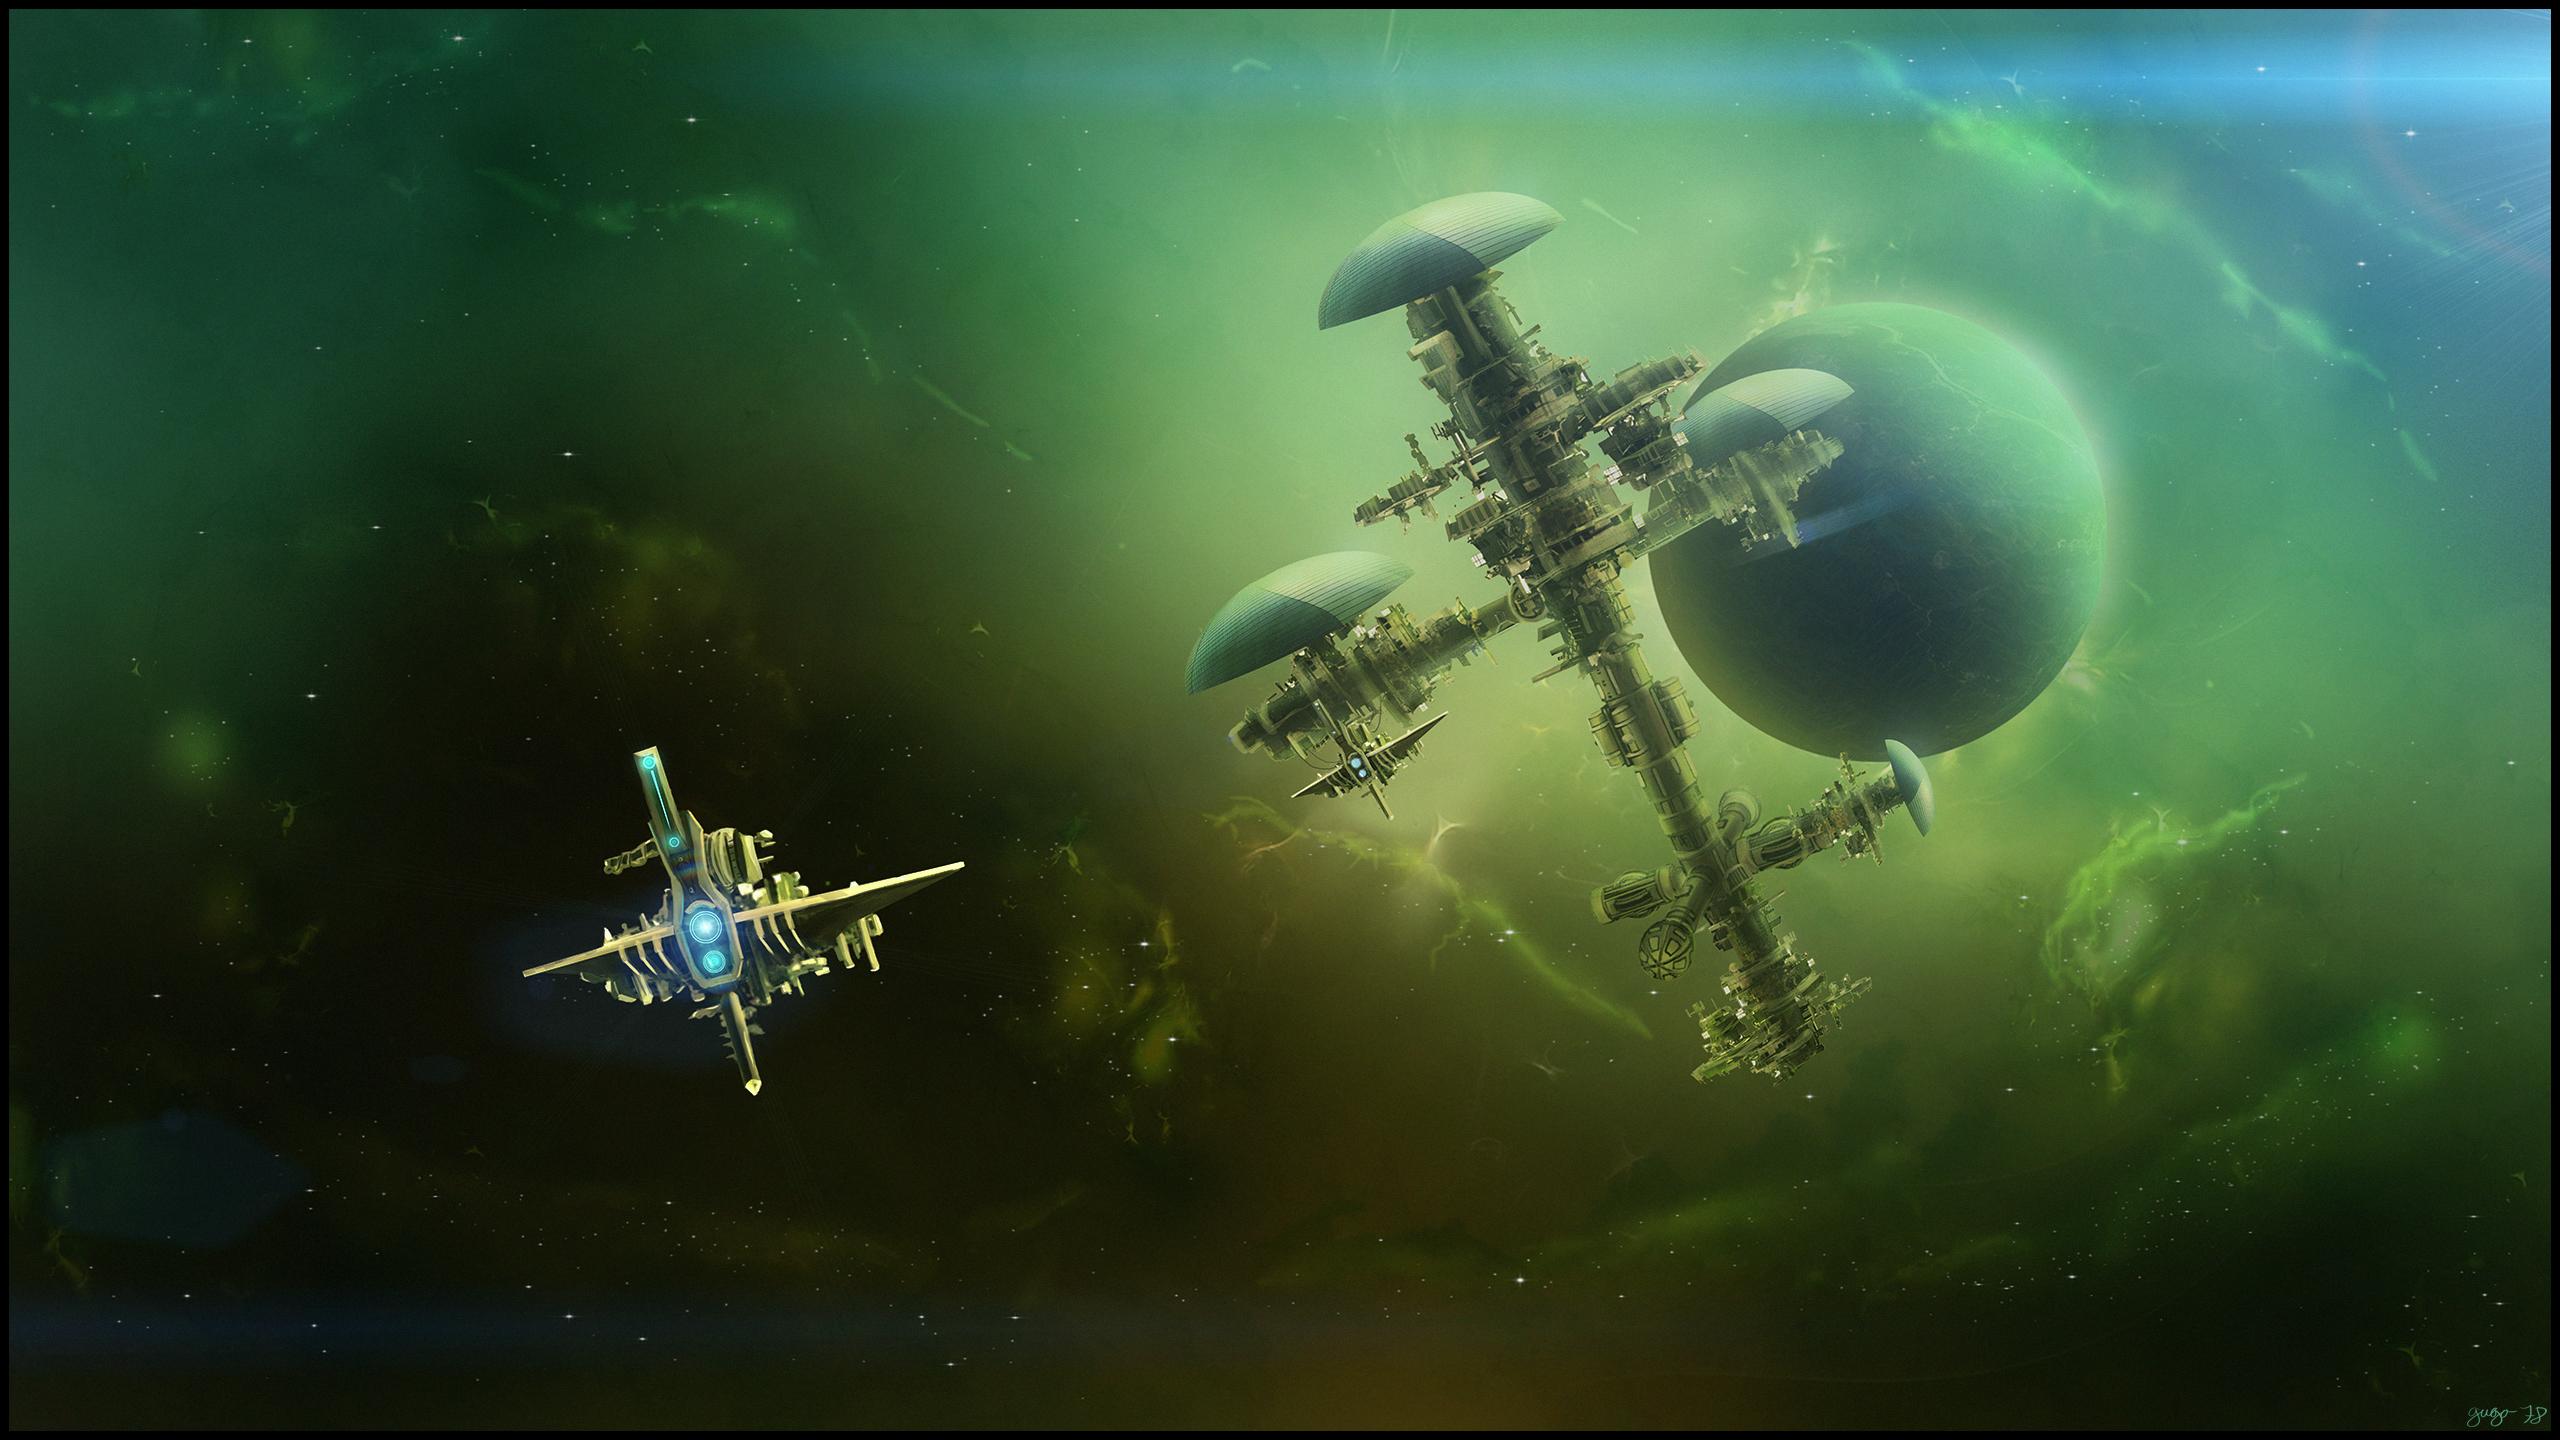 deep space 7